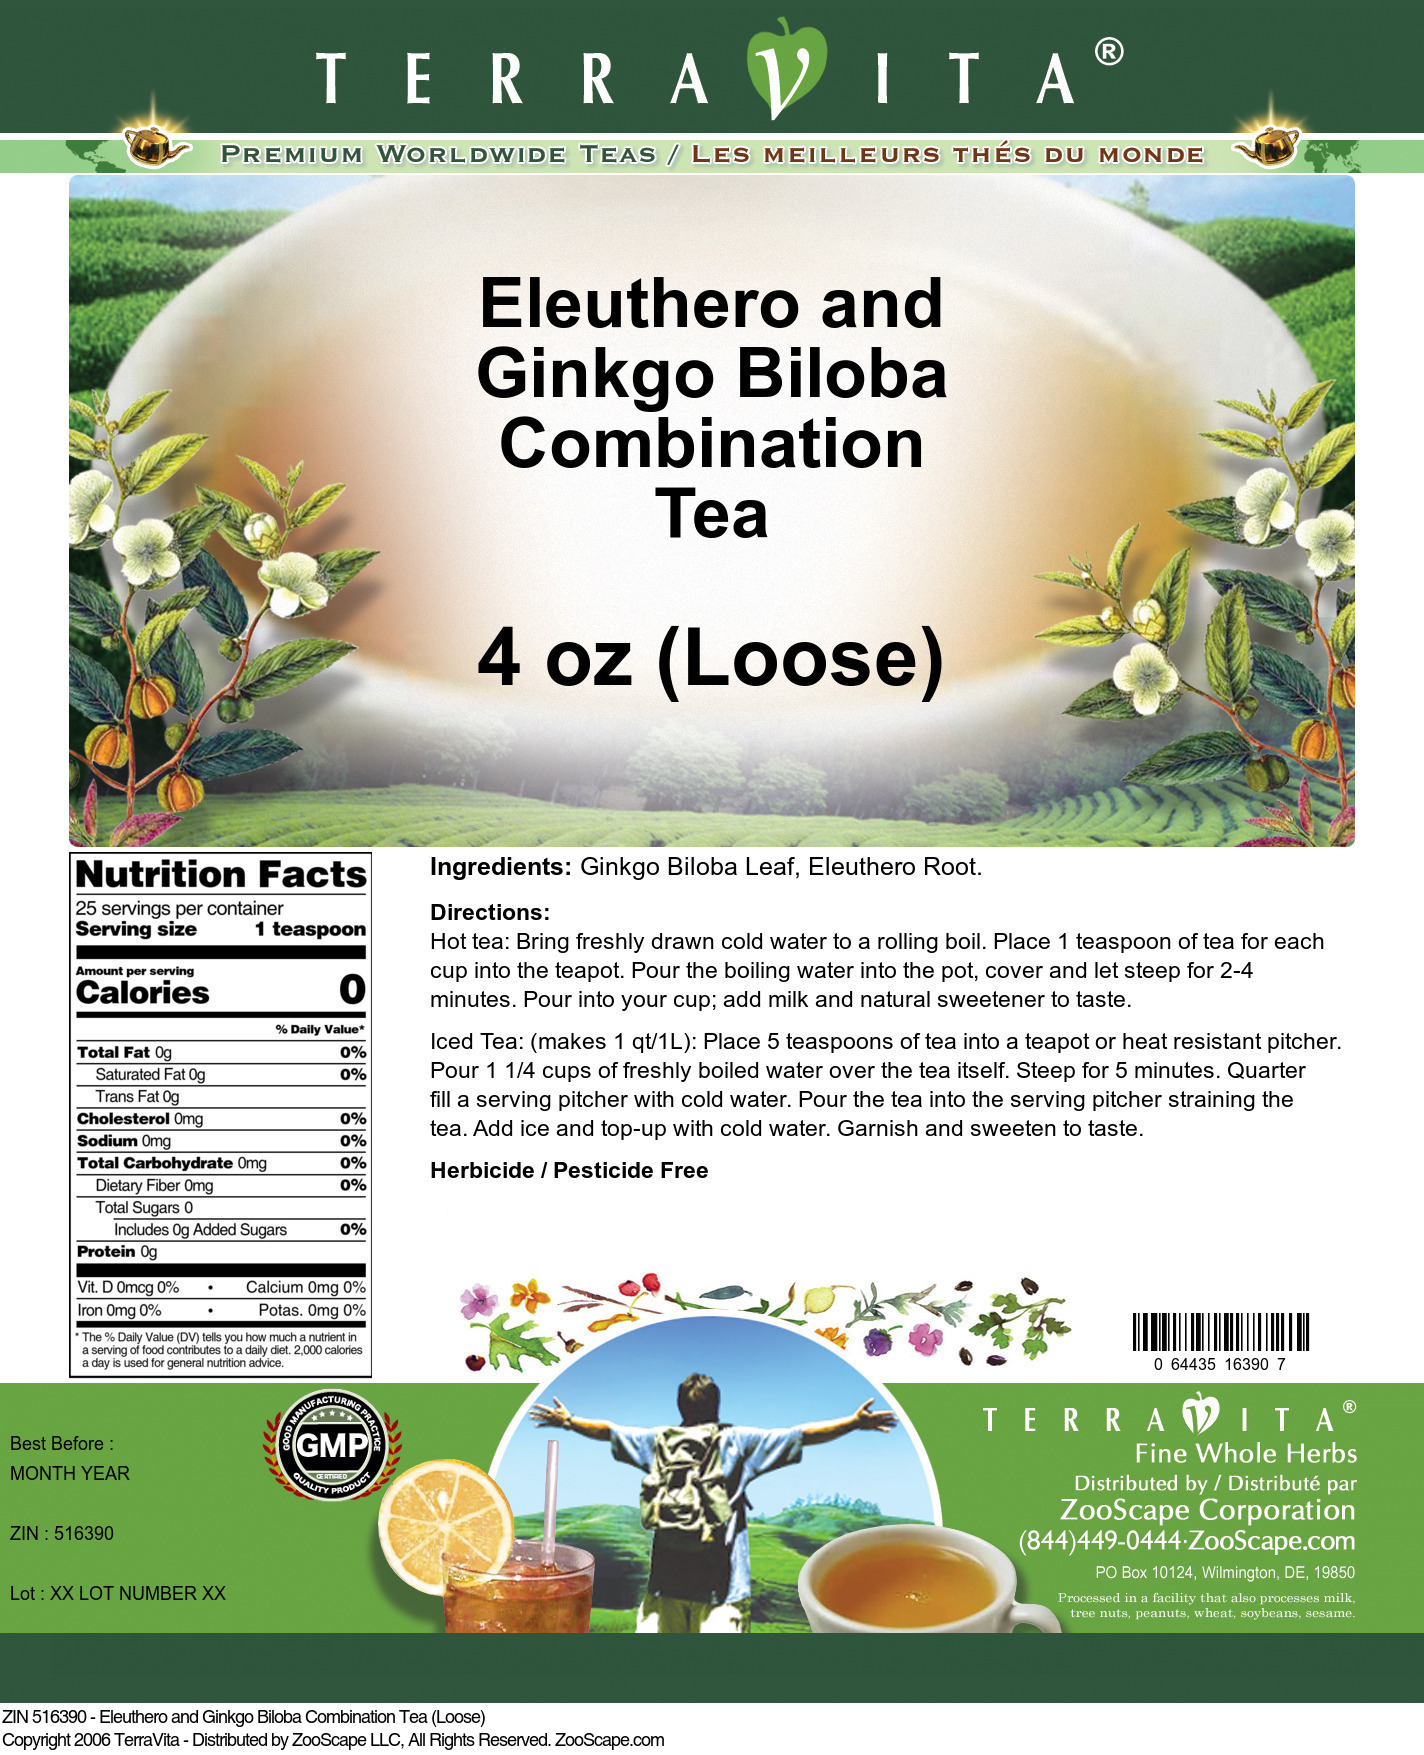 Eleuthero and Ginkgo Biloba Combination Tea (Loose)